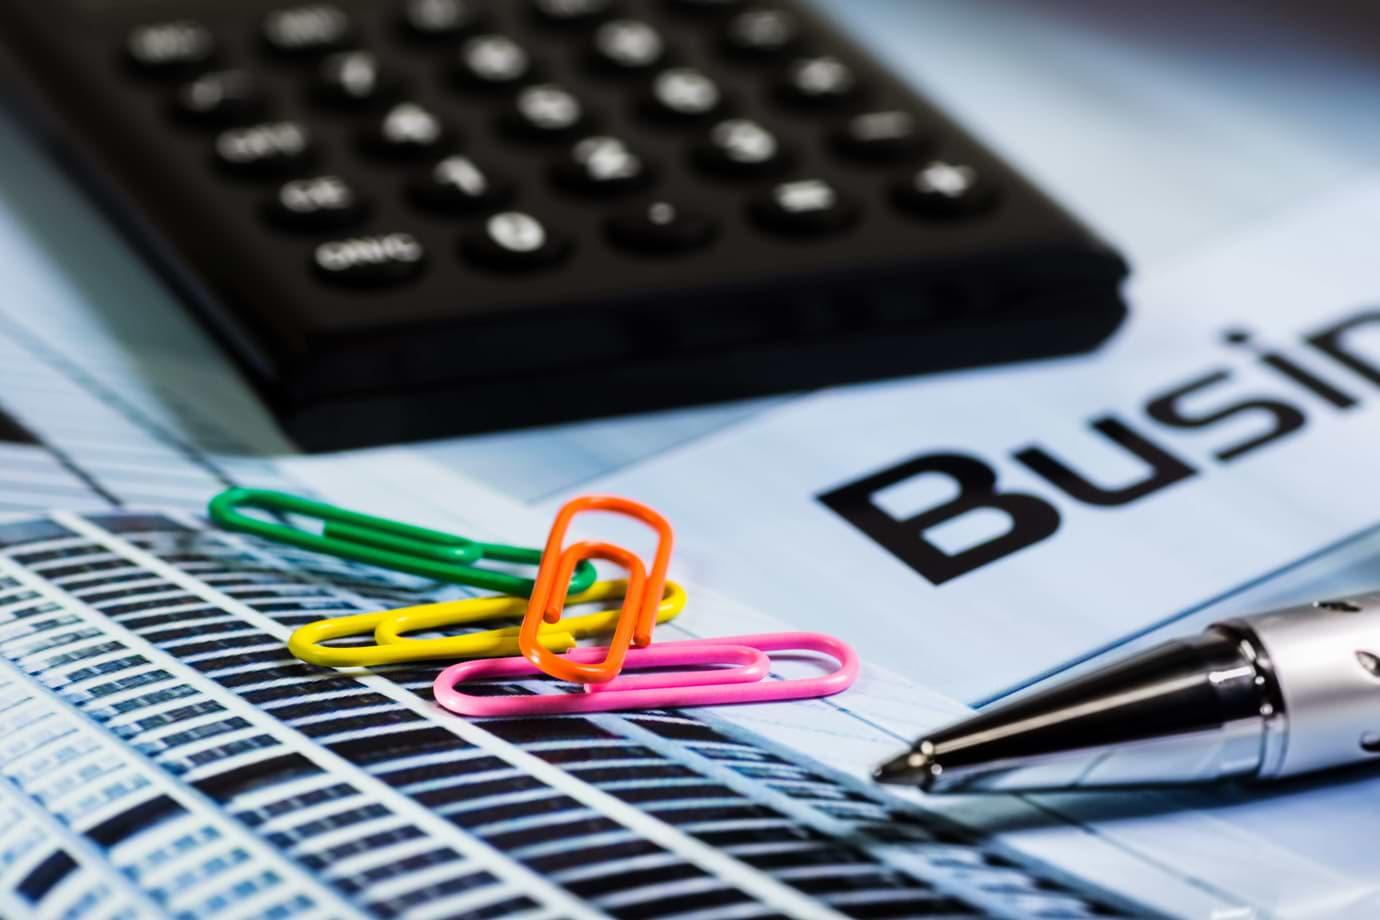 calculator-paperclip-pen-office-66862 (1)